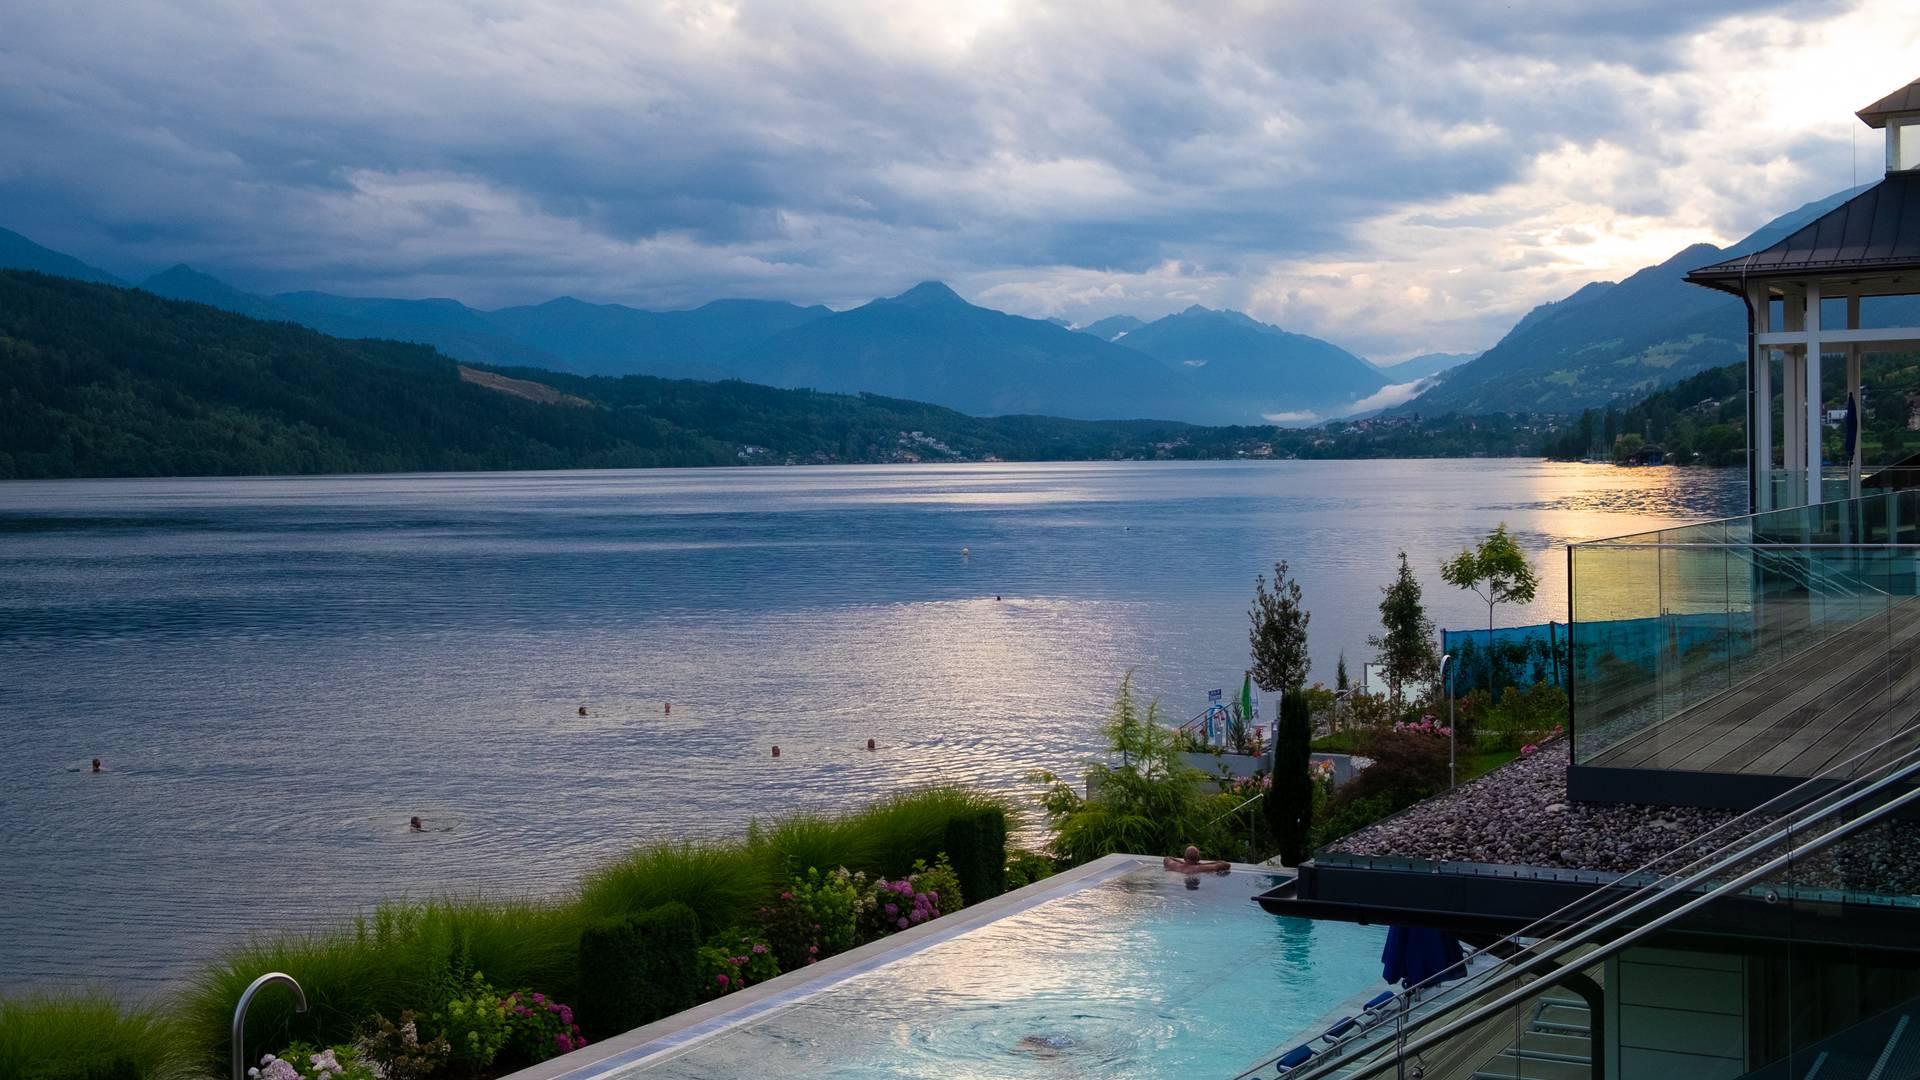 <p>Urlaub zu zweit am Millstätter See, Biwak am Campingplatz; Sabrina Schütt, Badehaus Millstatt</p>